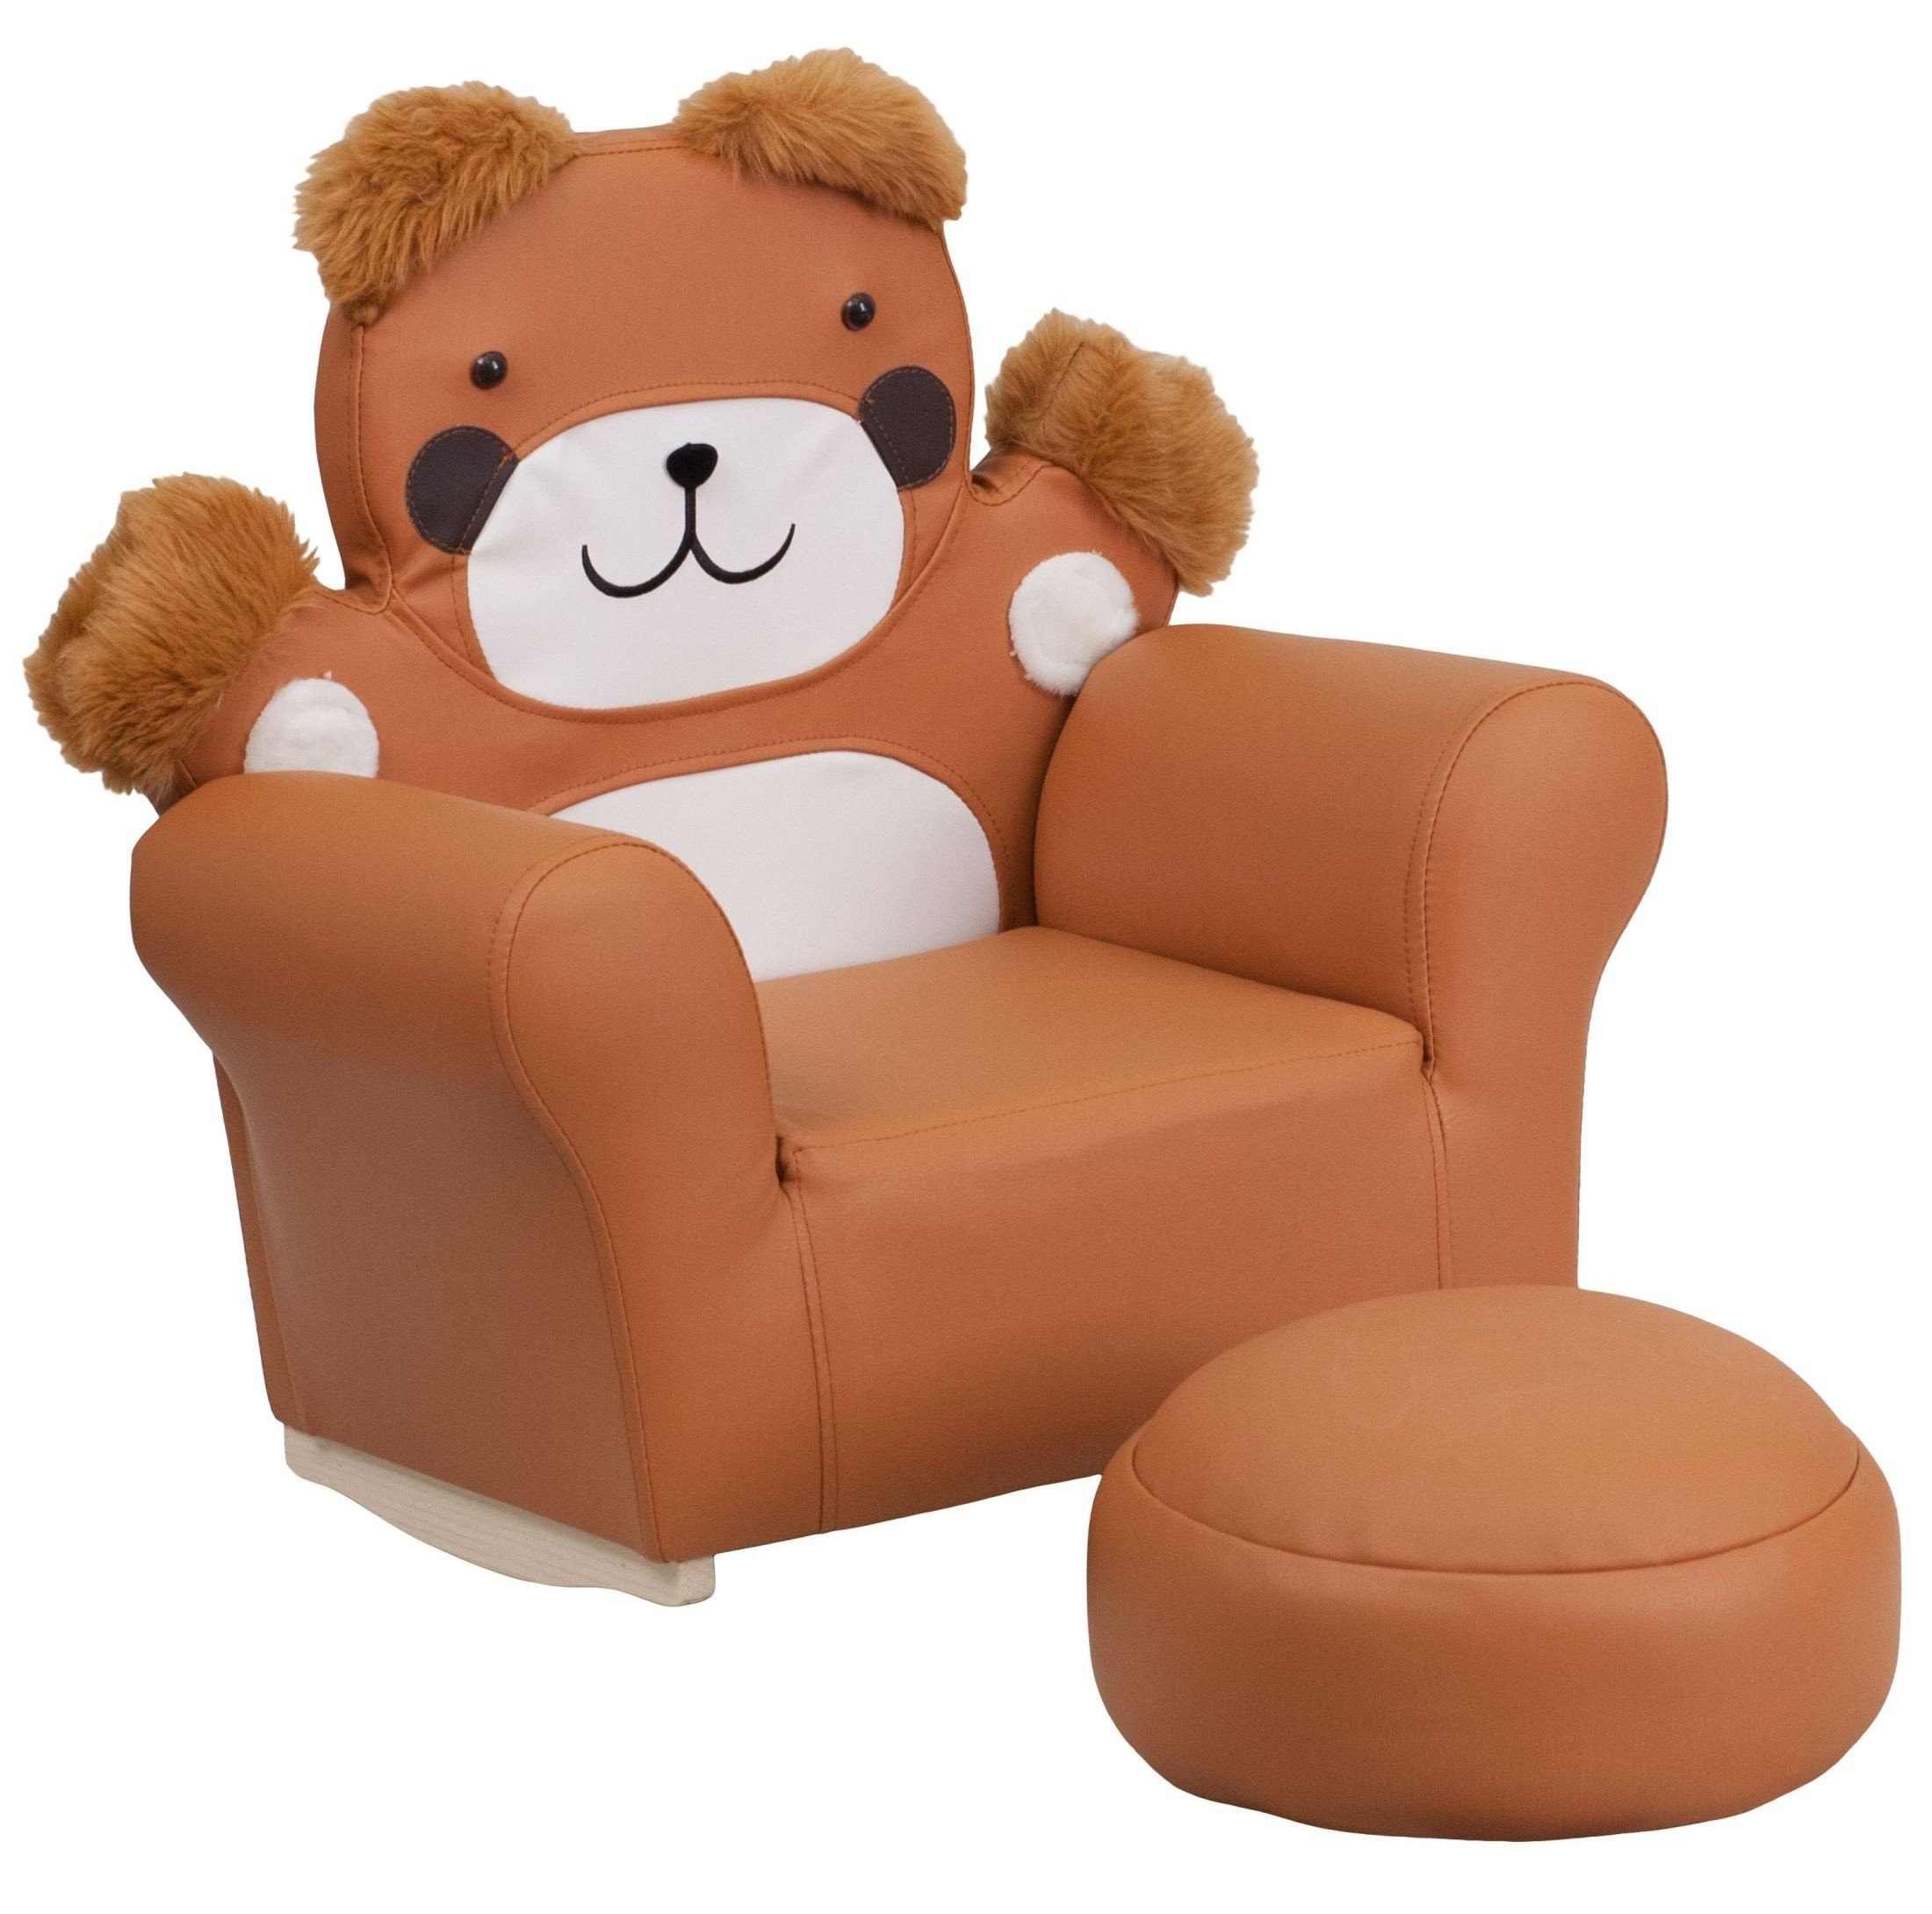 Kids Bear Rocker Chair And Footrest From Renegade HR 31